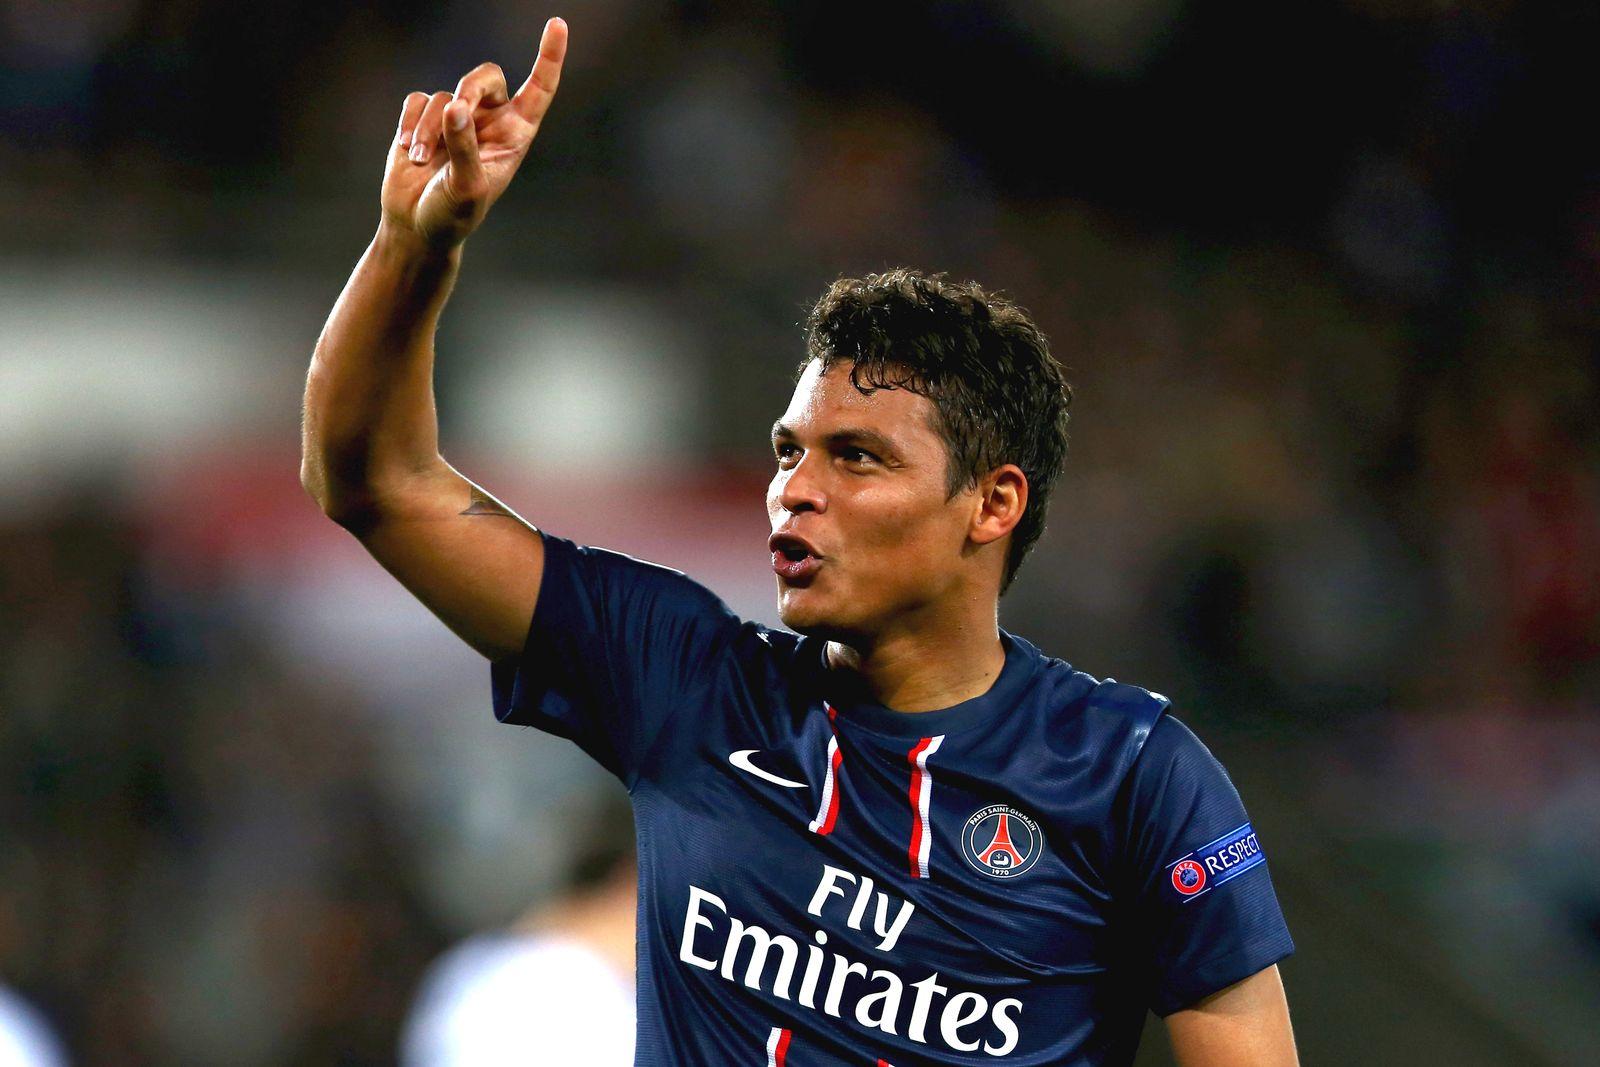 Thiago Silva / Paris Saint-Germain